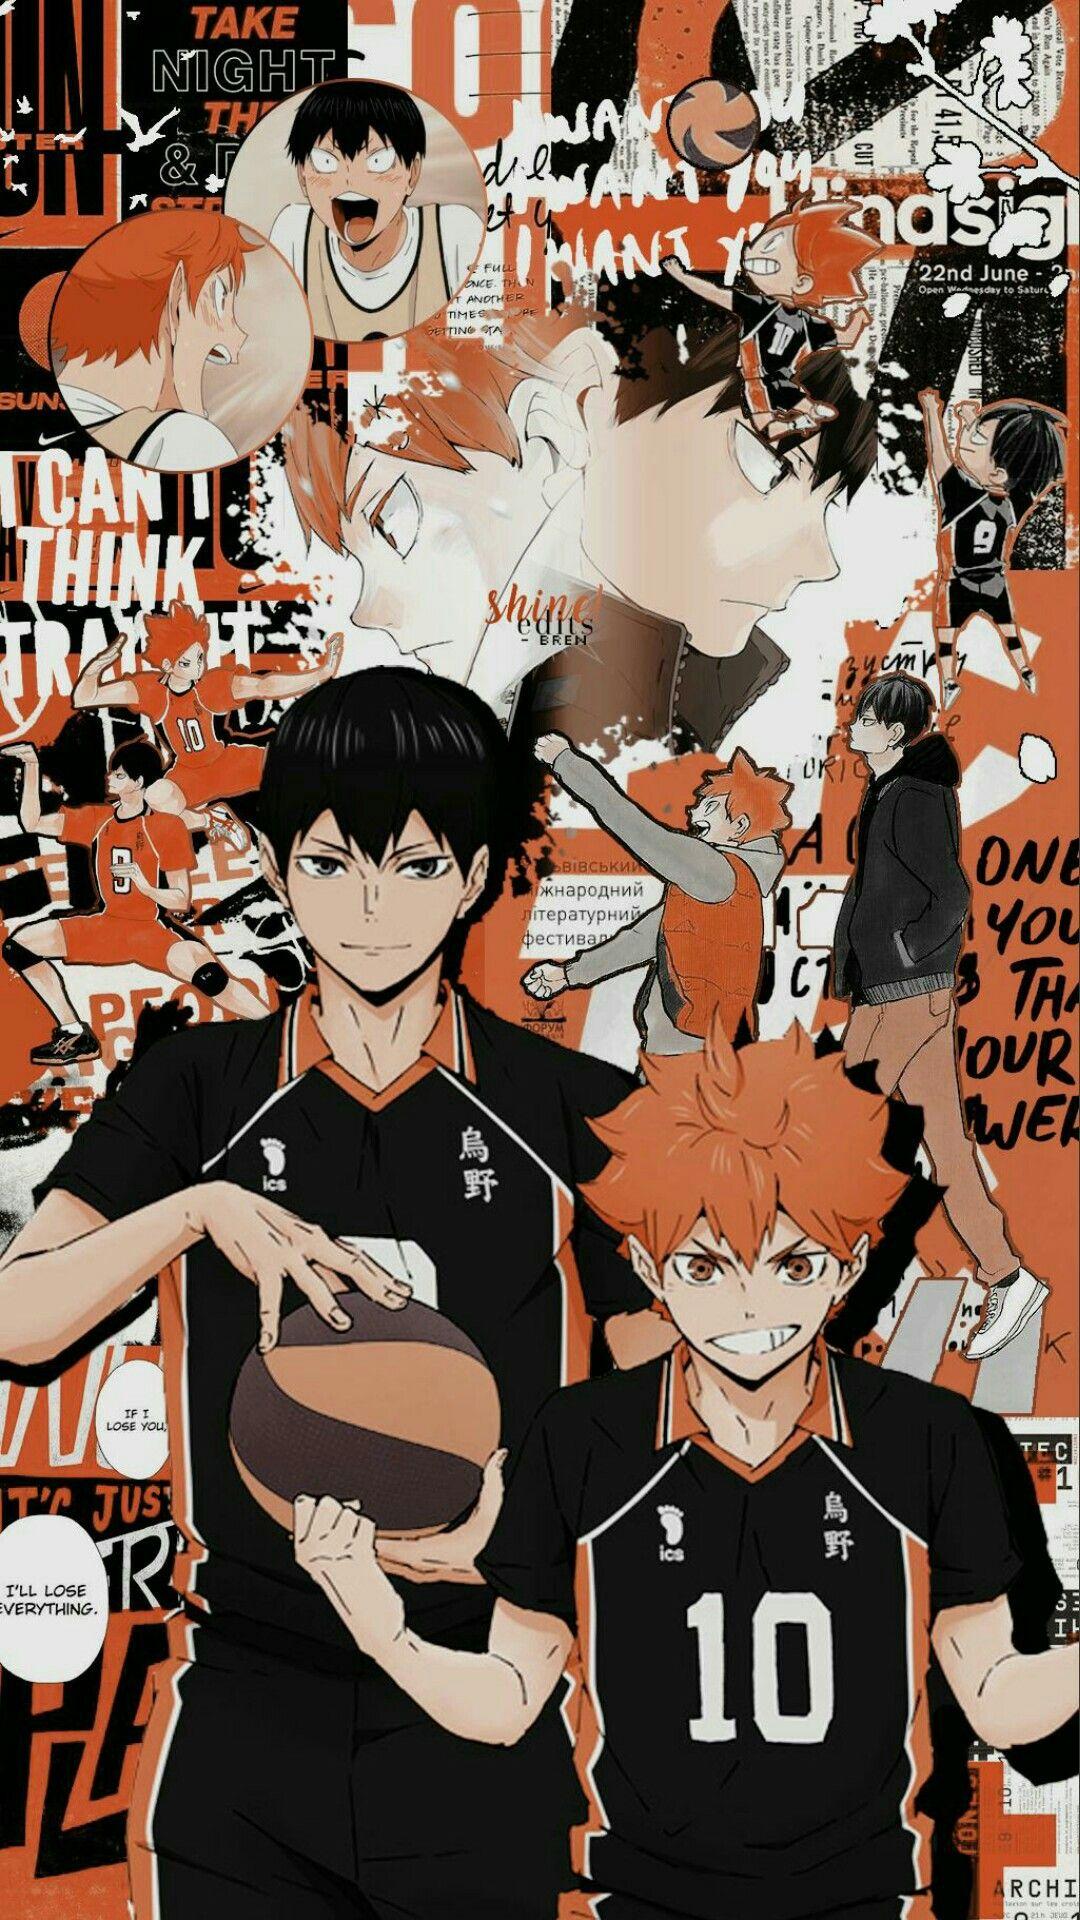 Idea by Tia Ledvina on Anime ️ Haikyuu anime